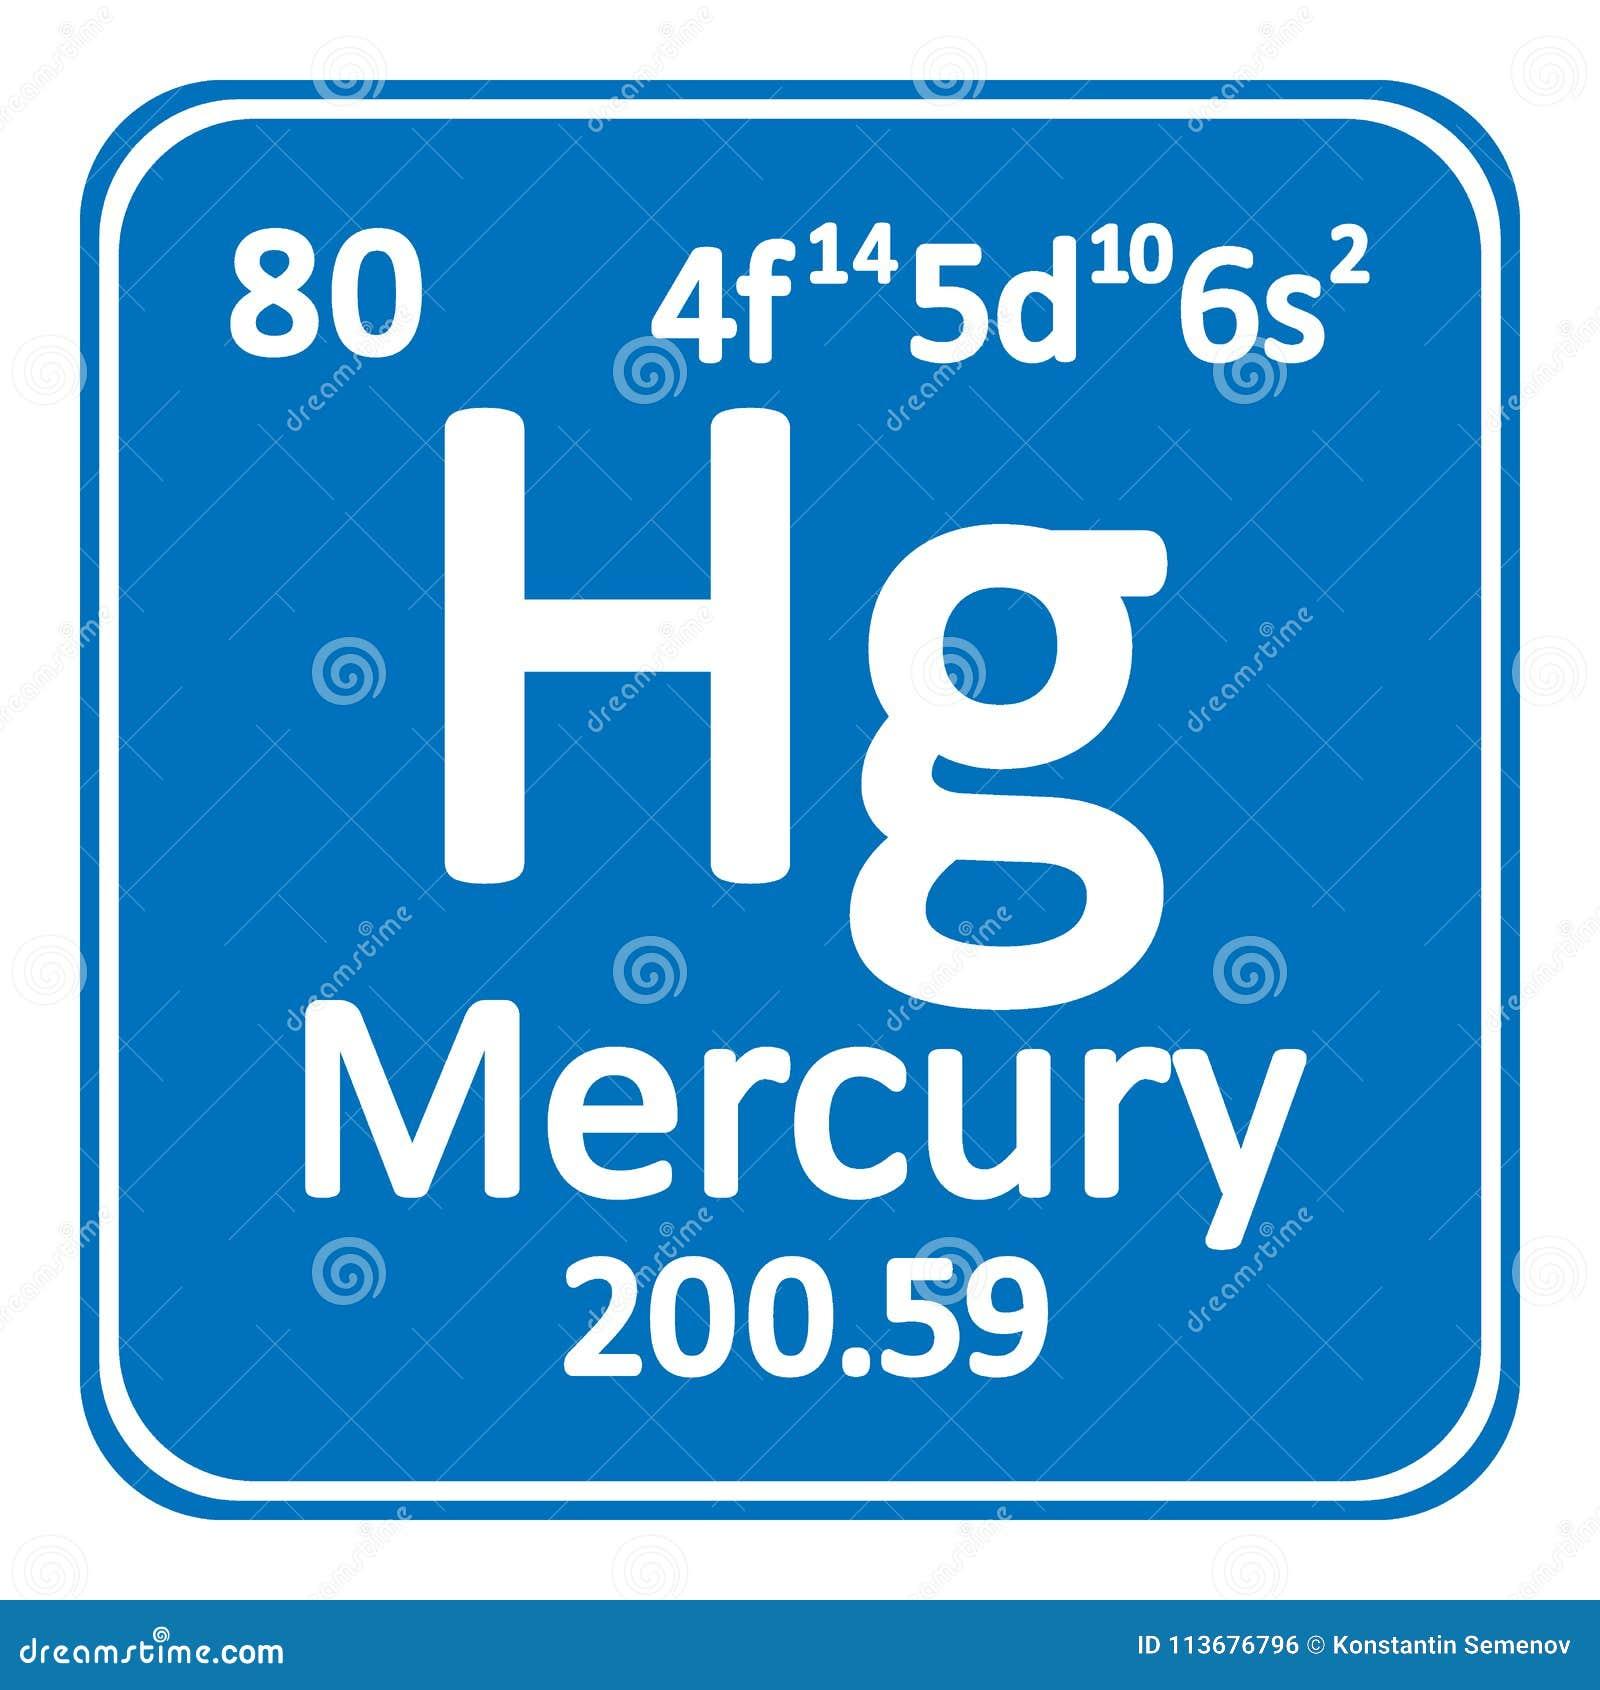 Periodic Table Element Mercury Icon Stock Illustration